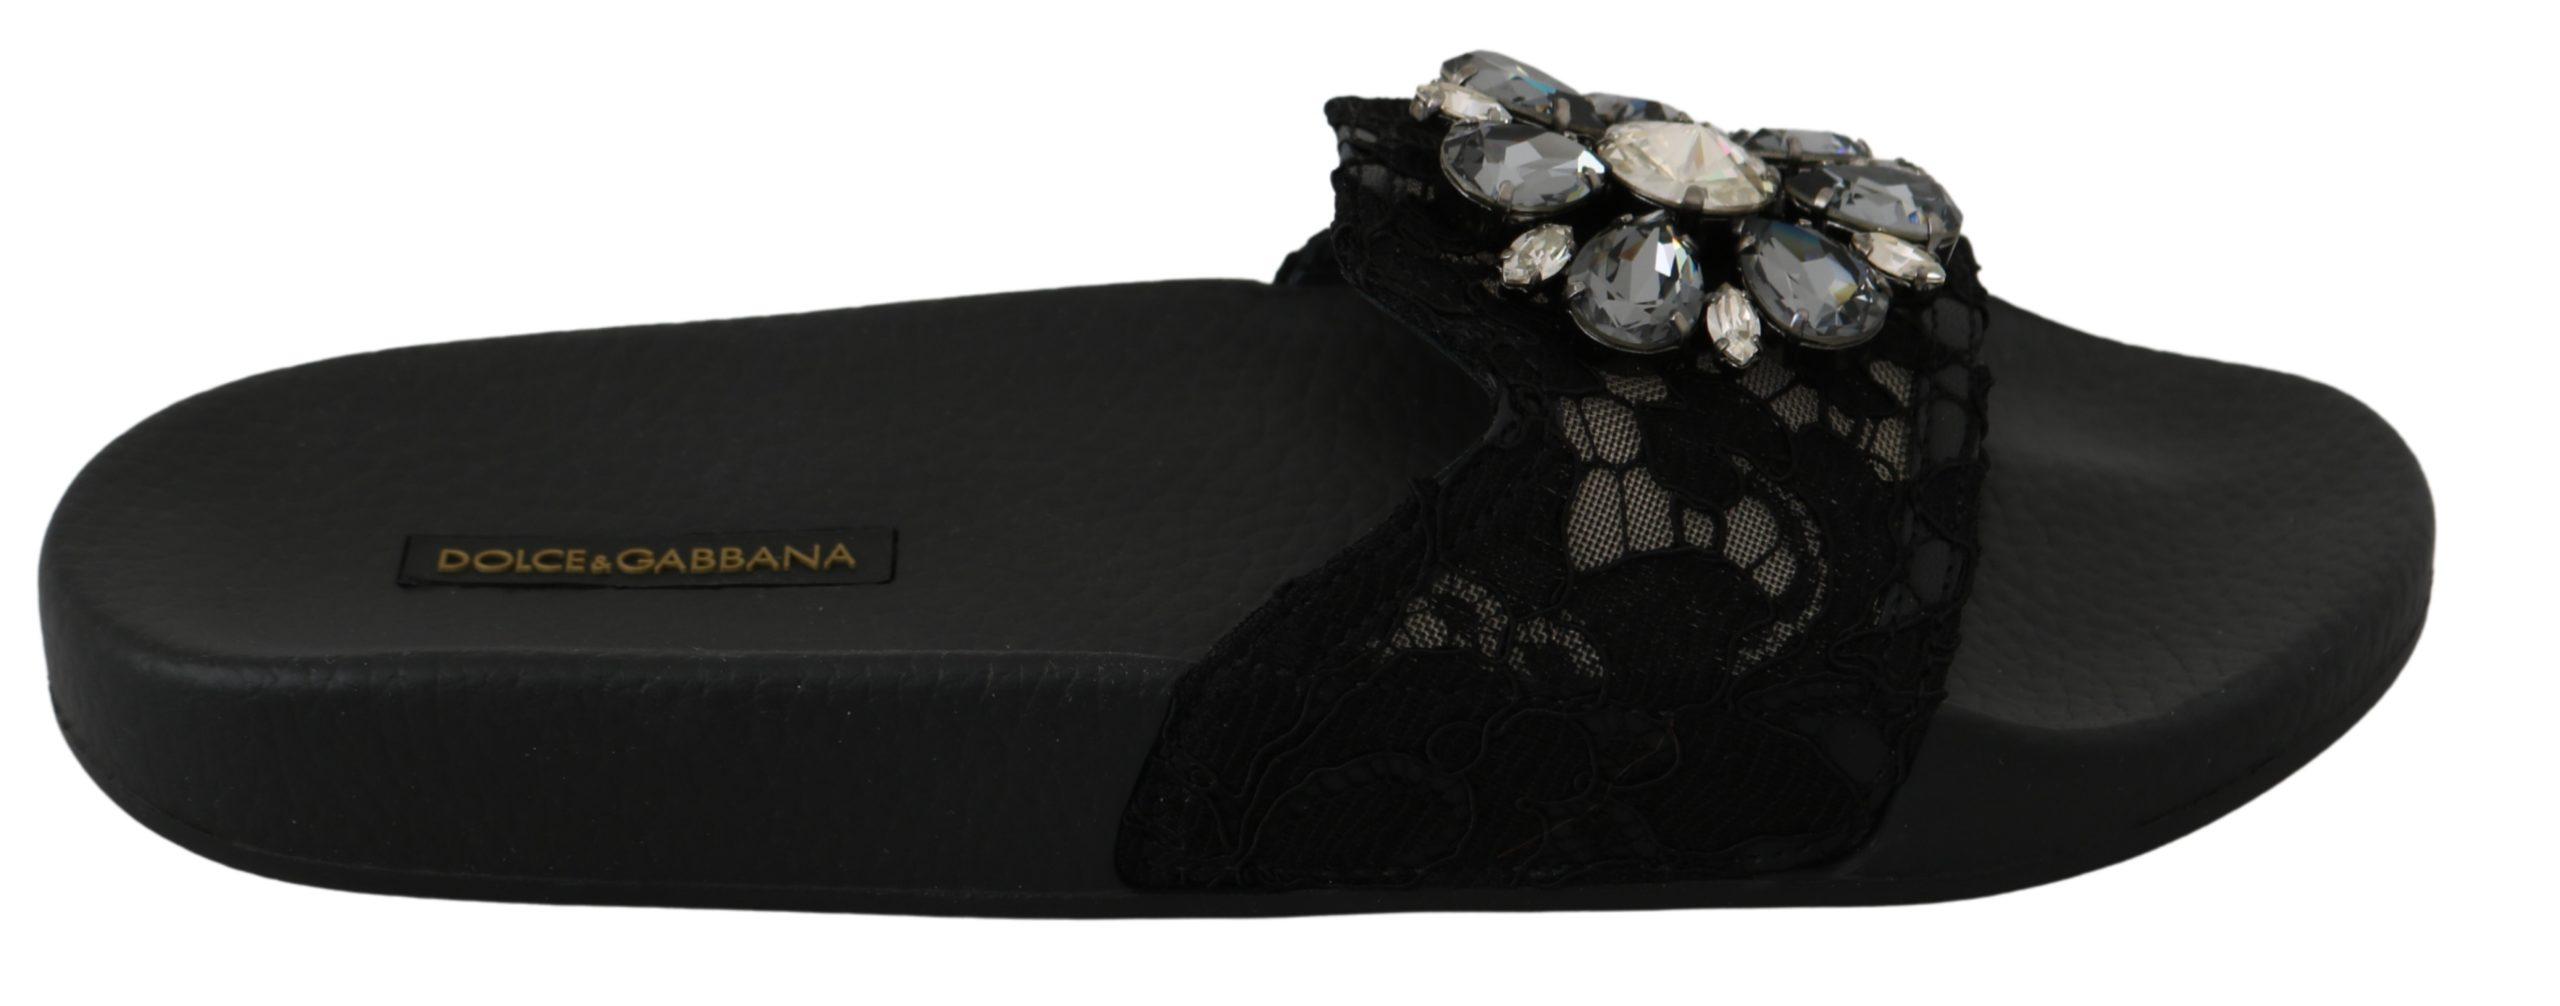 Dolce & Gabbana Women's Lace Crystal Beach Sandals Black LA6569 - EU35/US4.5